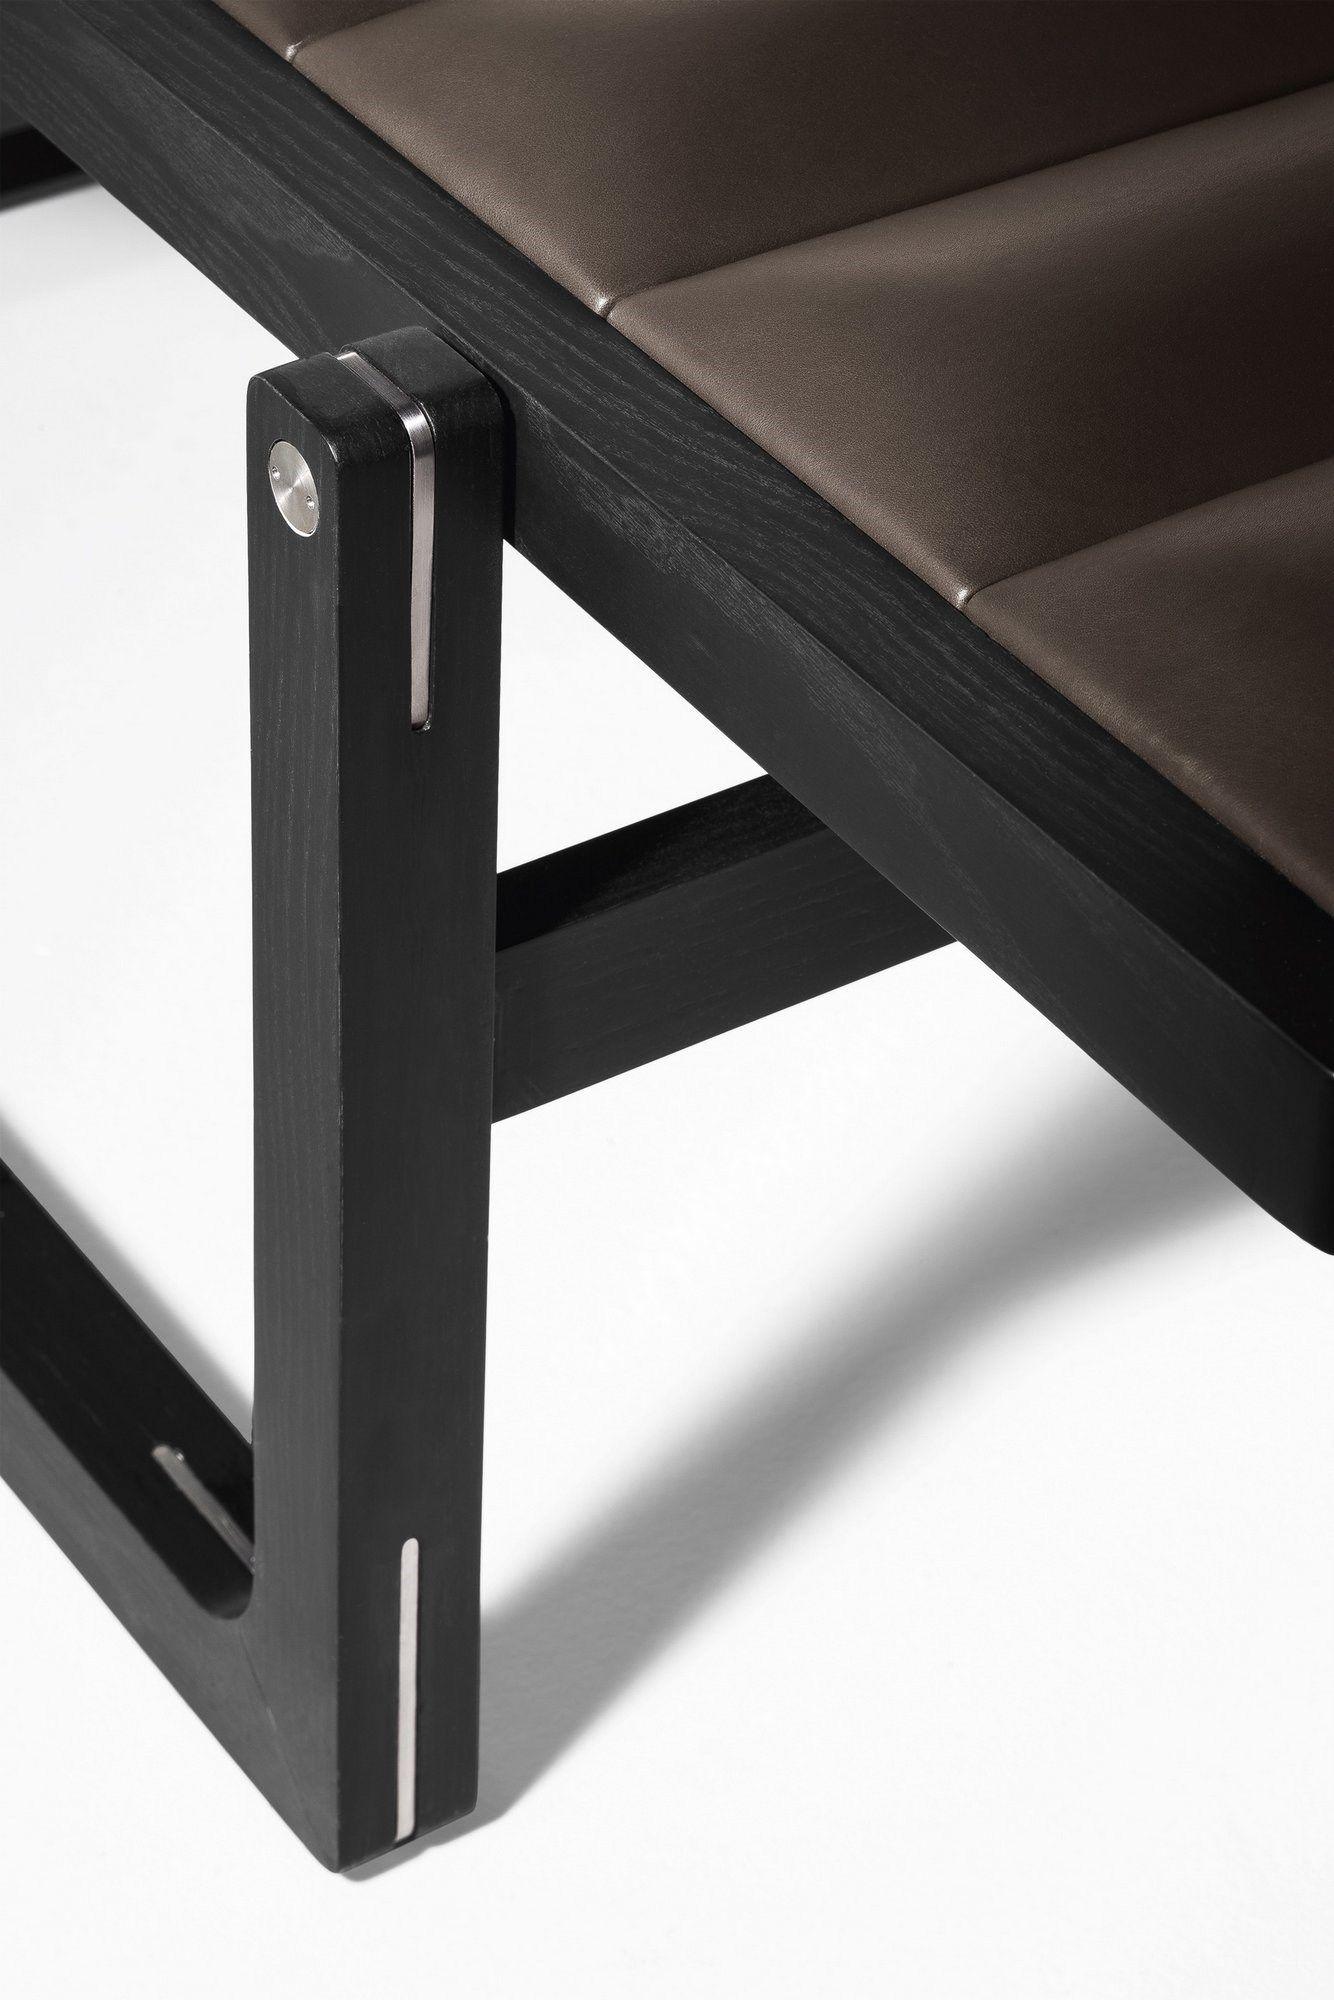 Chaise longue imbottita in pelle BYRON By Poltrona Frau design Jean ...